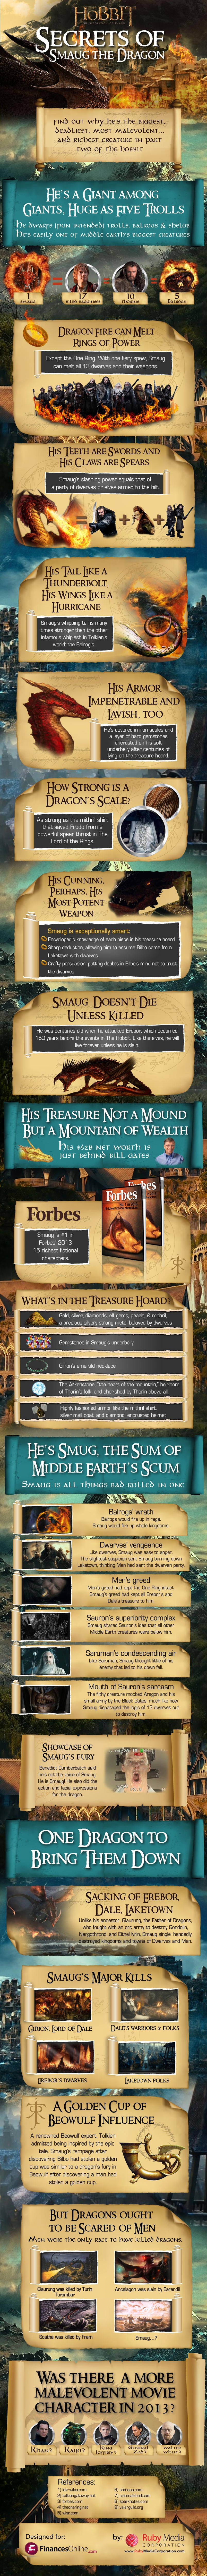 hobbit infographic